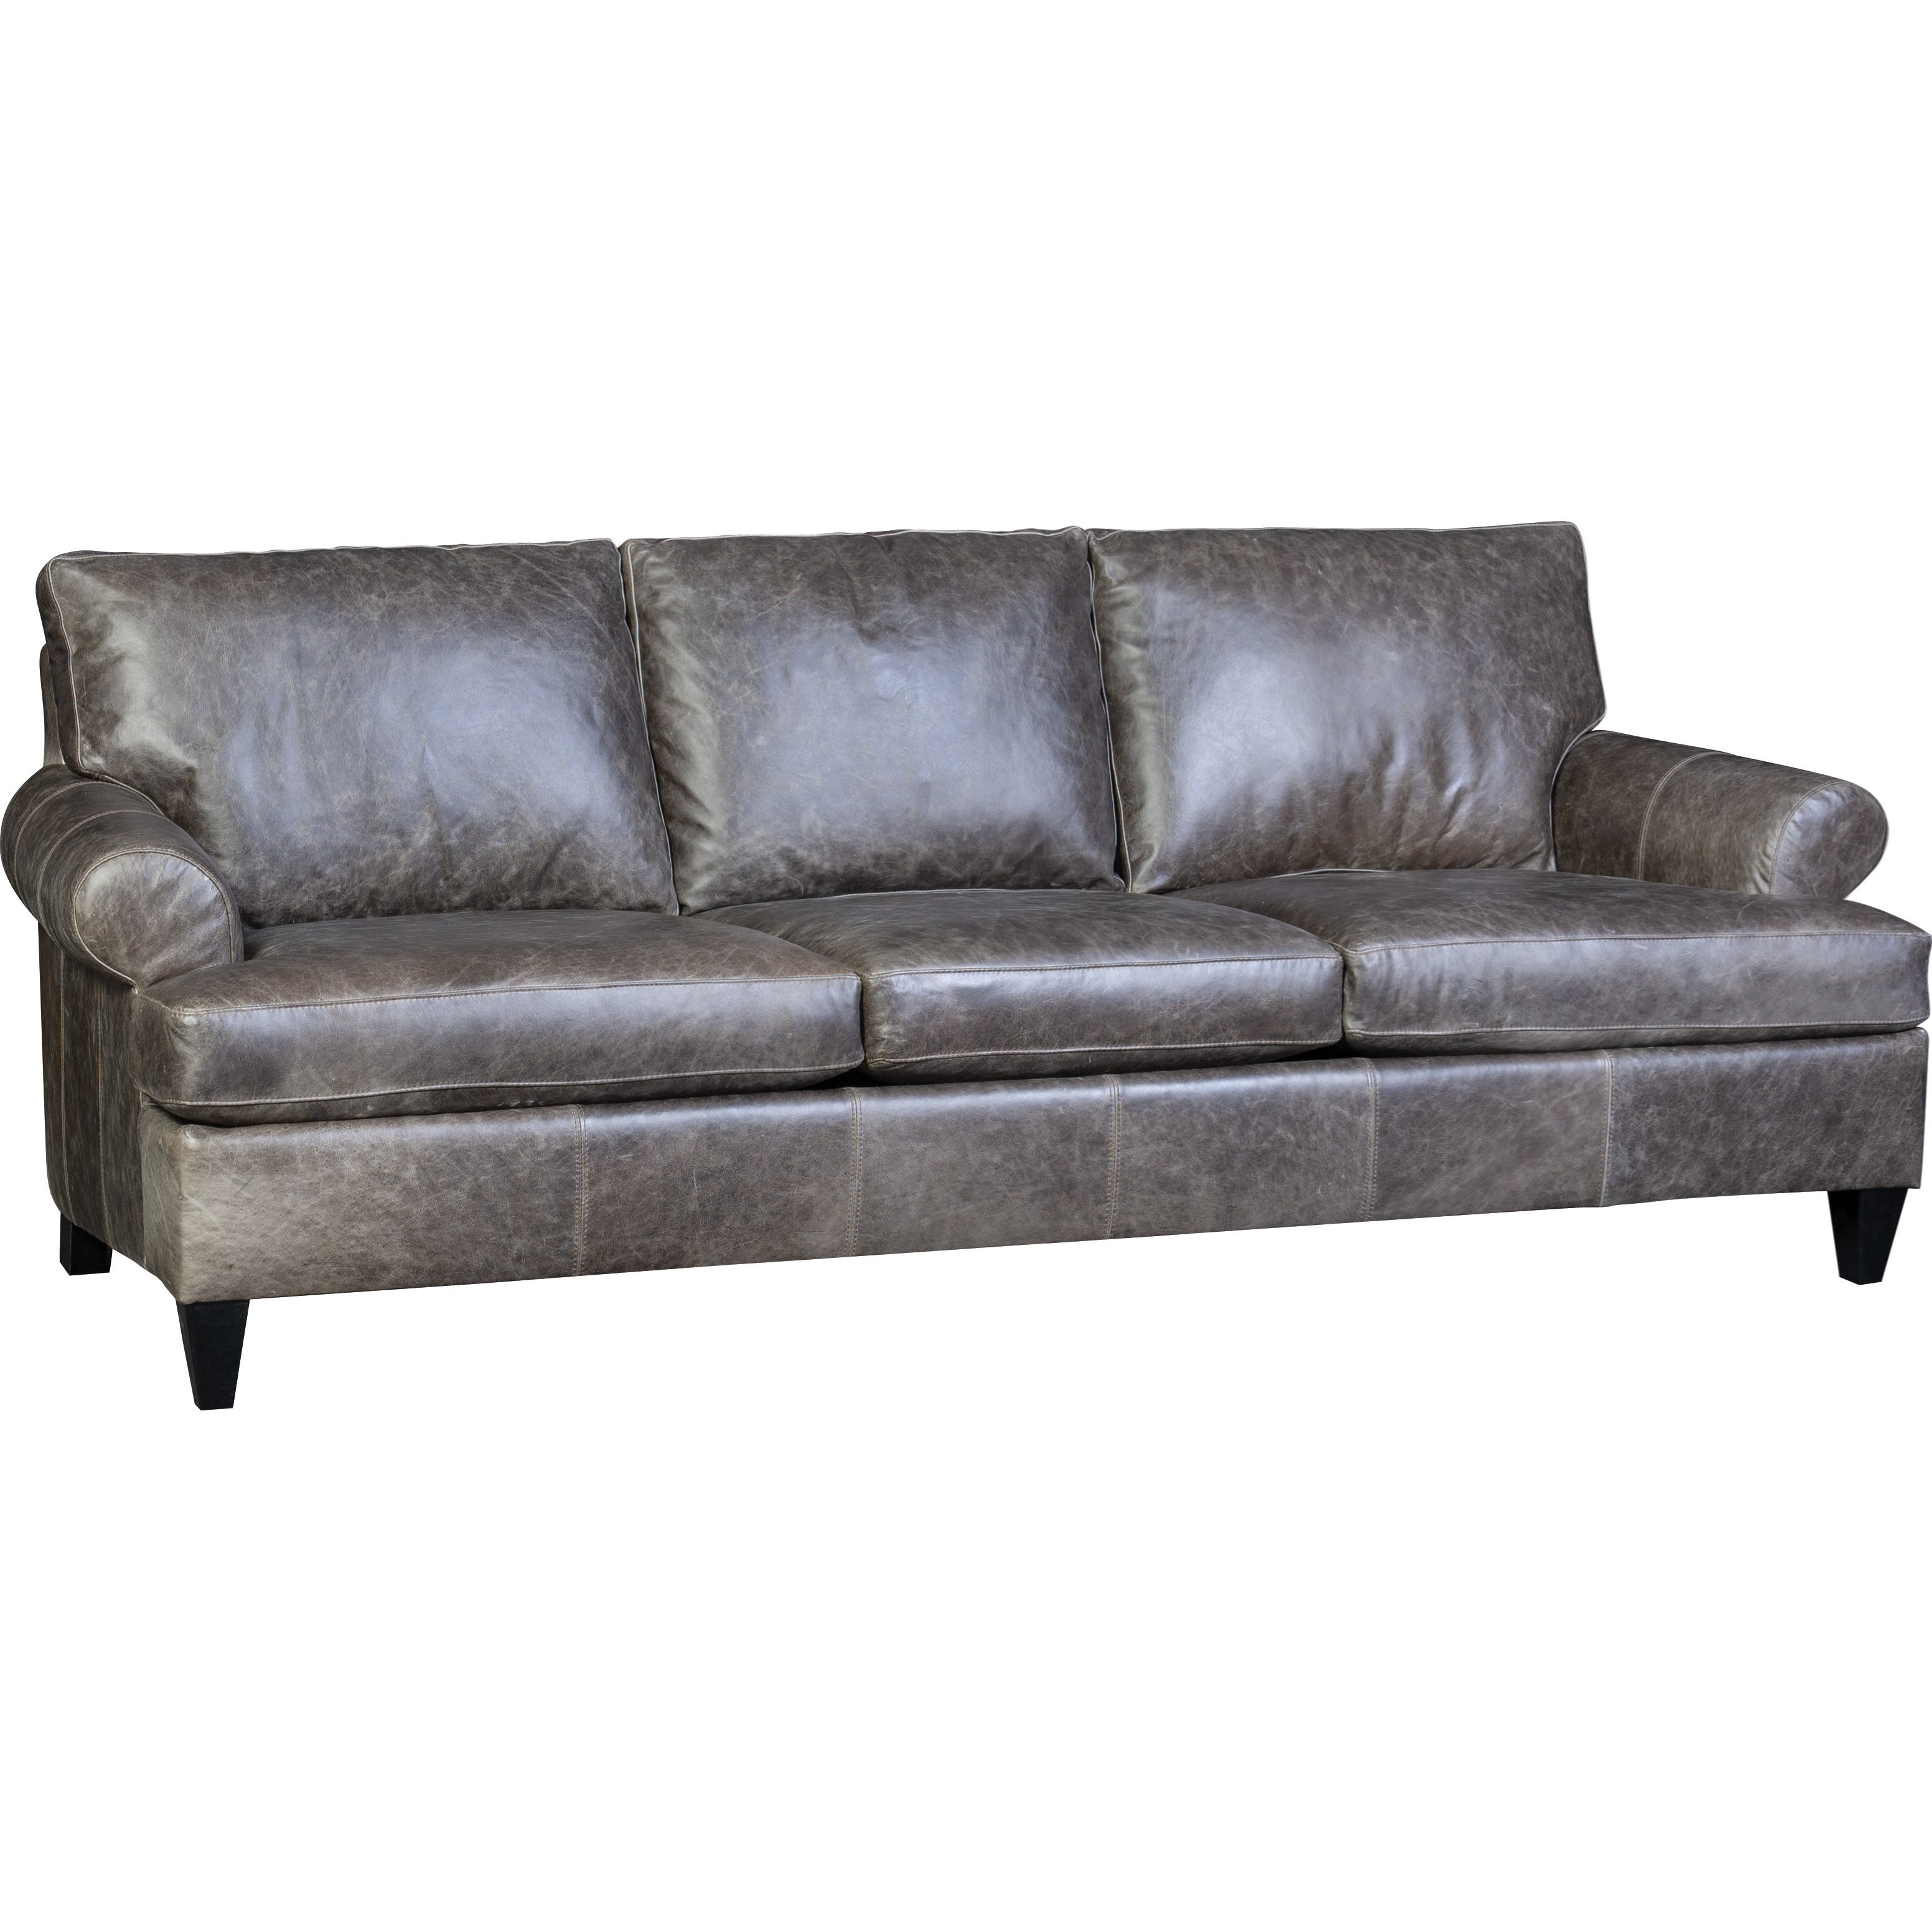 3270 Sofa by Mayo at Story & Lee Furniture